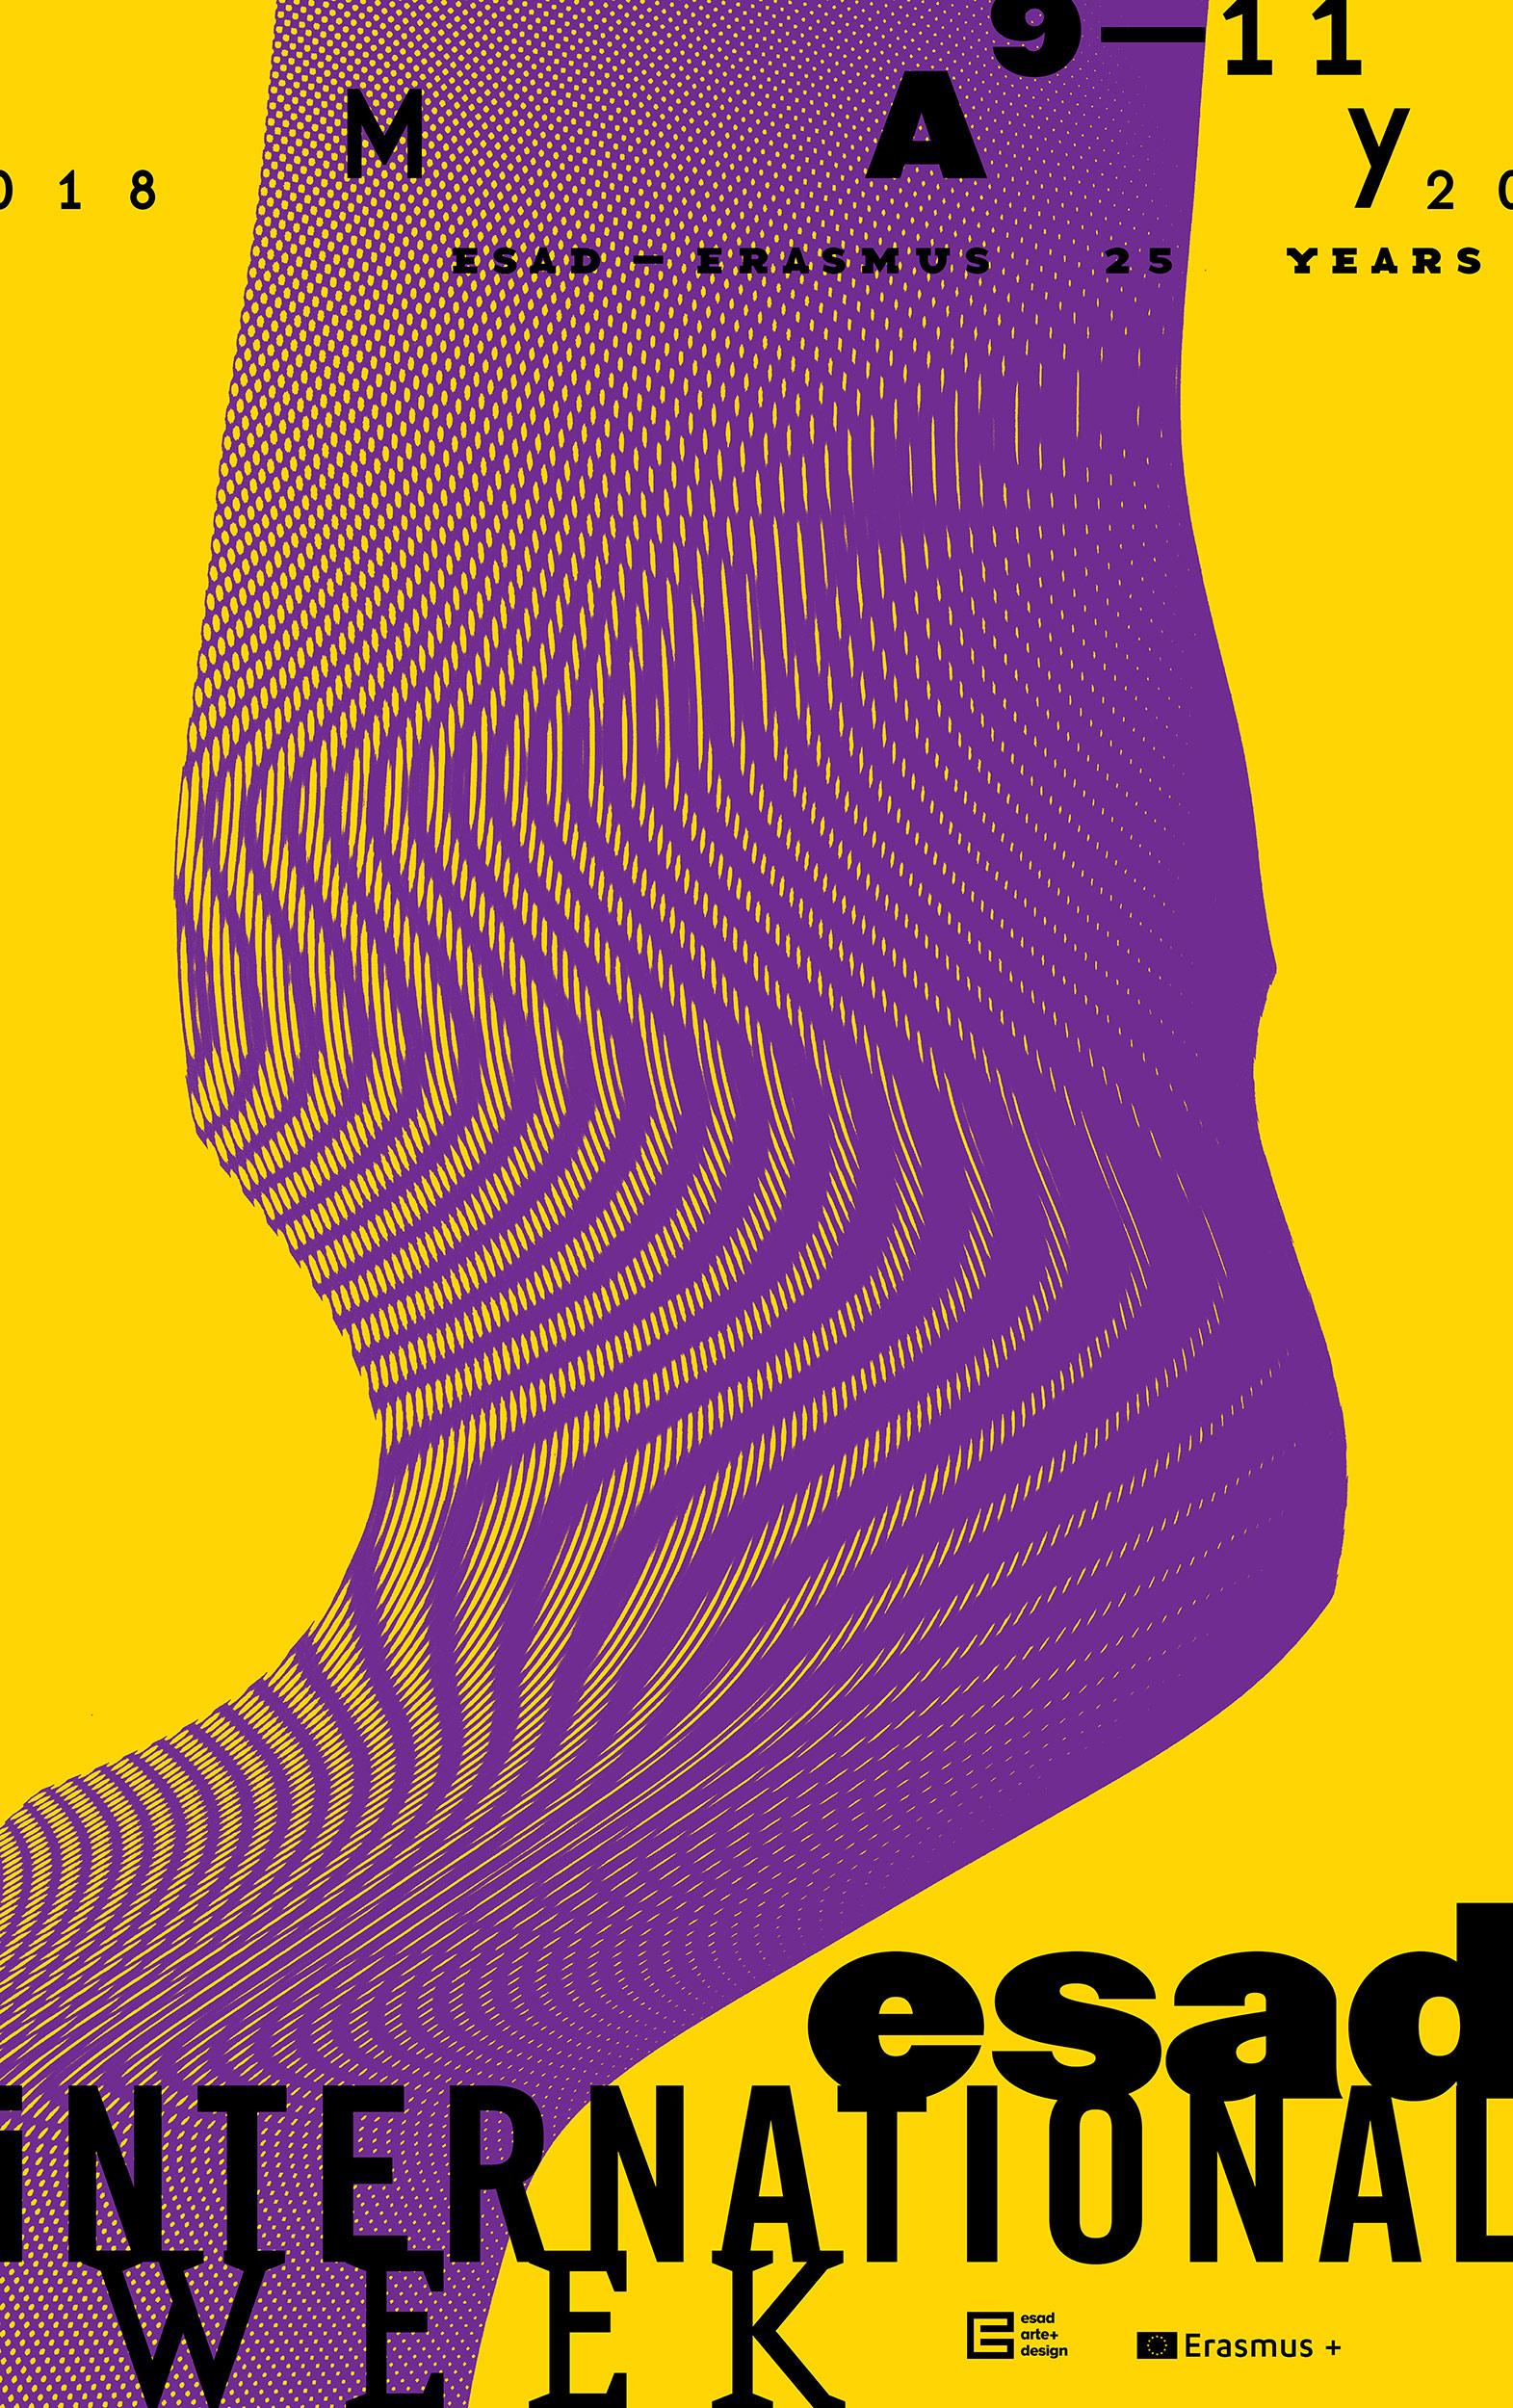 Esad International Week by Sérgio Correia - Creative Work - $i